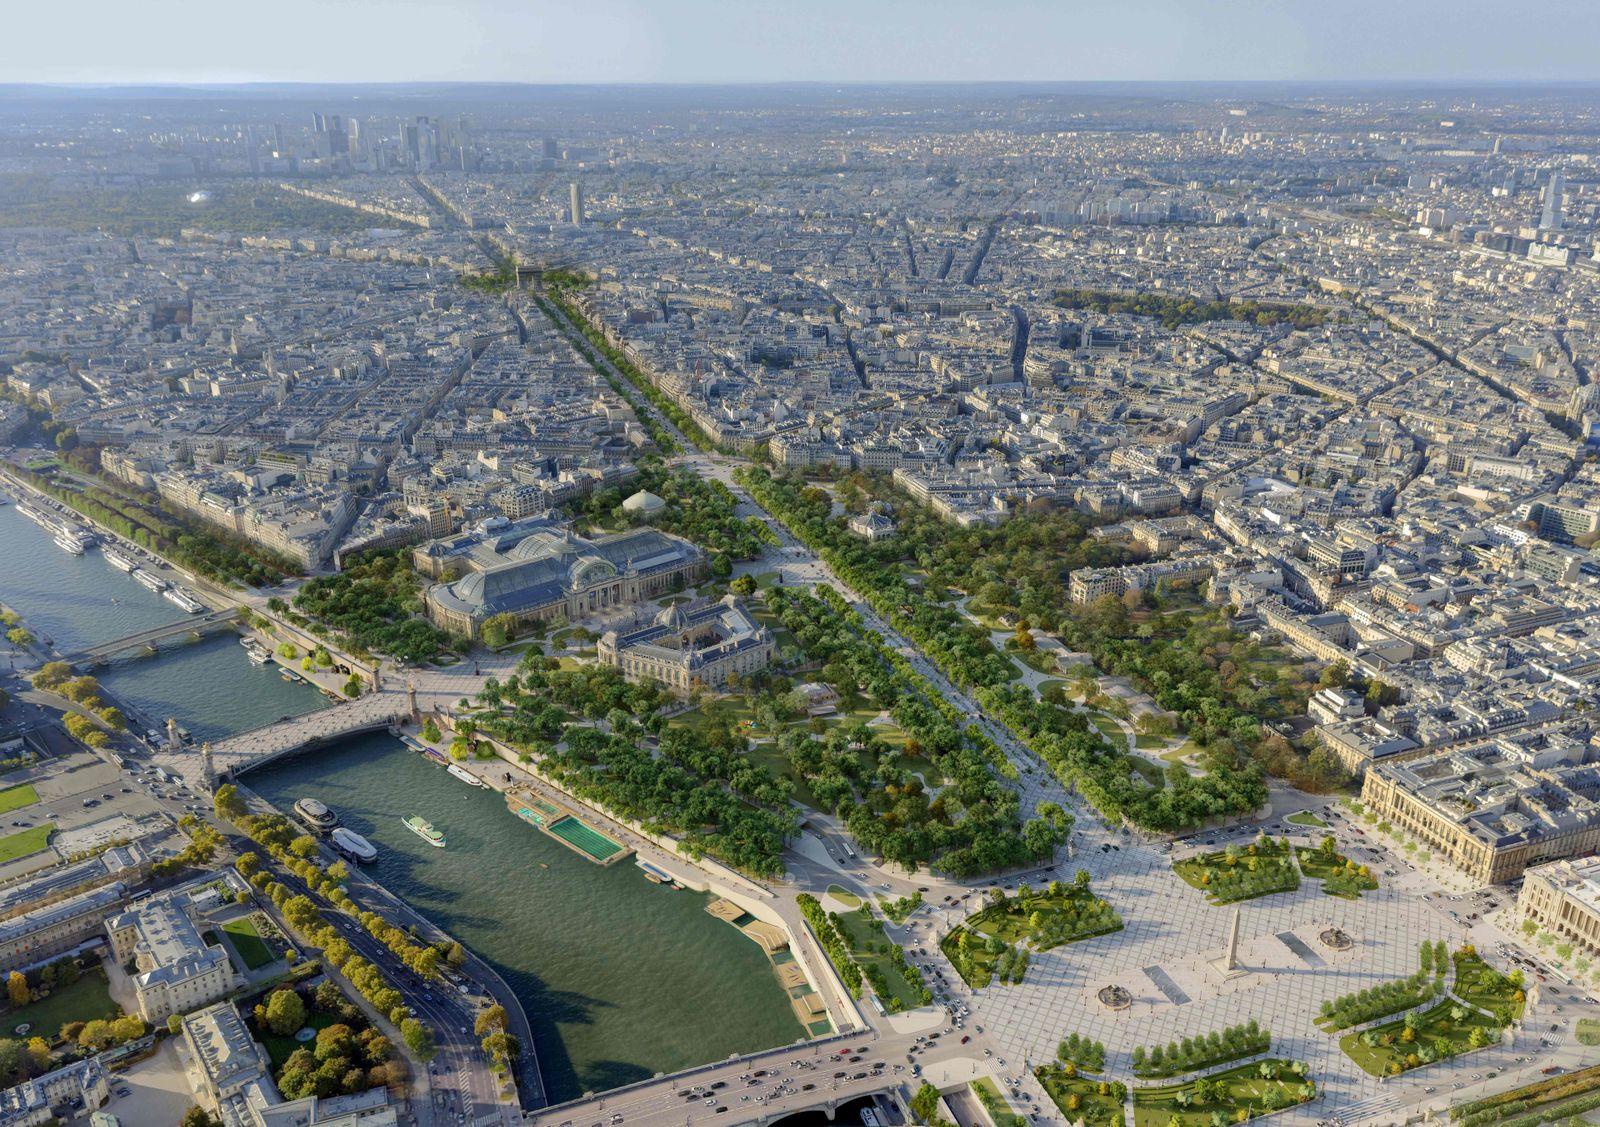 FRANCE-URBANISATION-ENVIRONMENT-PARIS-CHAMPS-ELYSEES